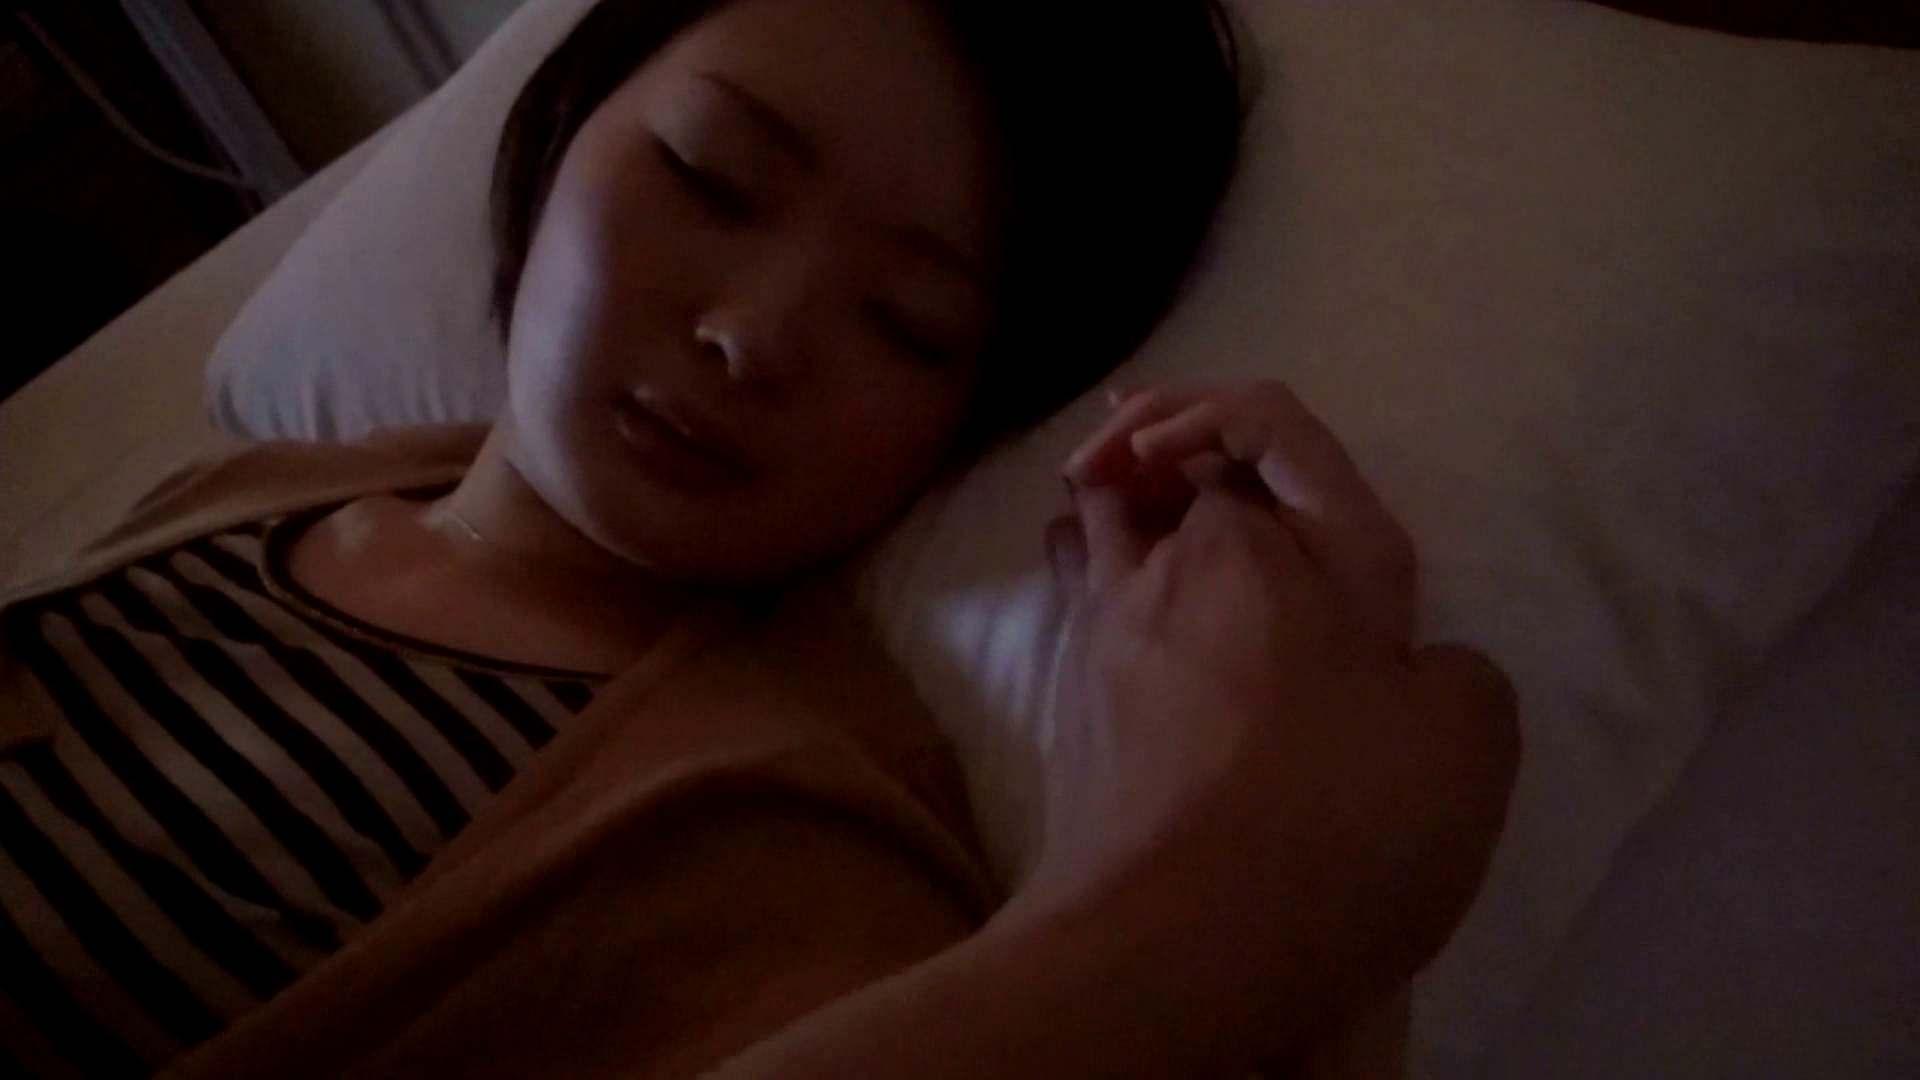 vol.31 【KTちゃん】現役JD居酒屋アルバイト 3回目? ビッチな女子大生  85枚 30